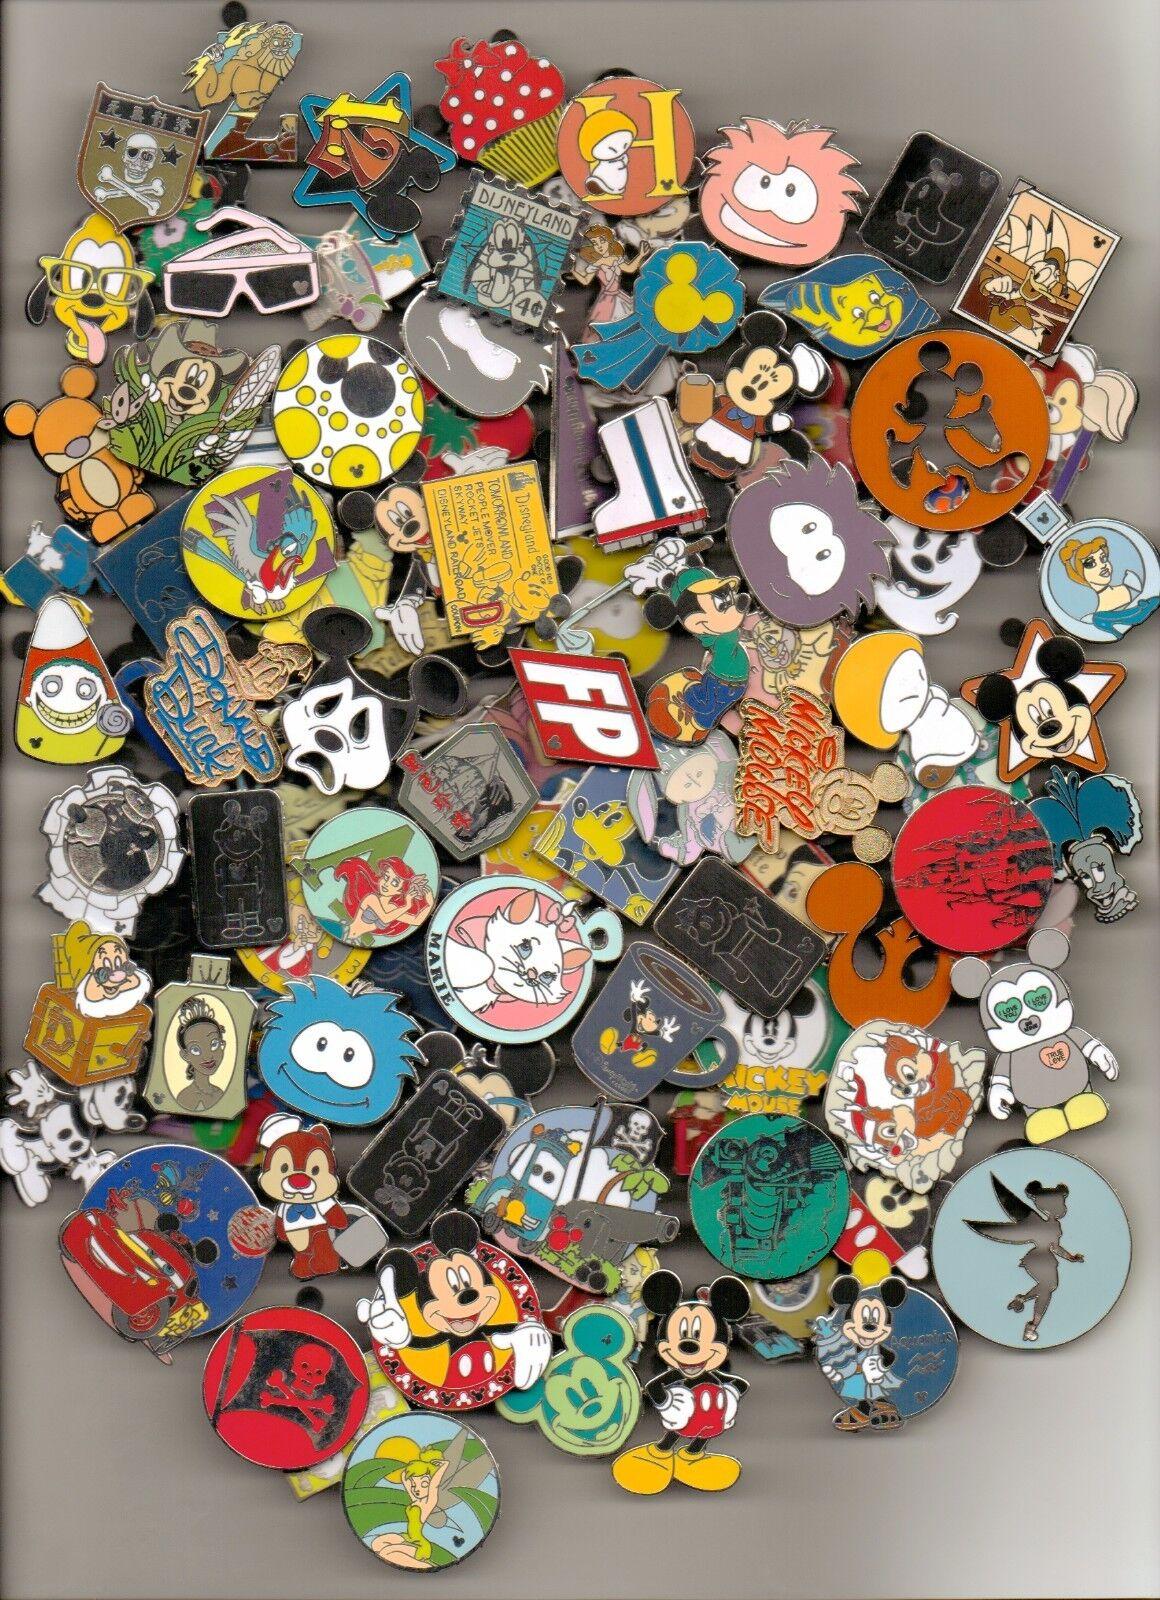 Disney Trading Pin Pick Quantity Save $$ Lot Of 25, Need 50, 100, 200 We Got UM